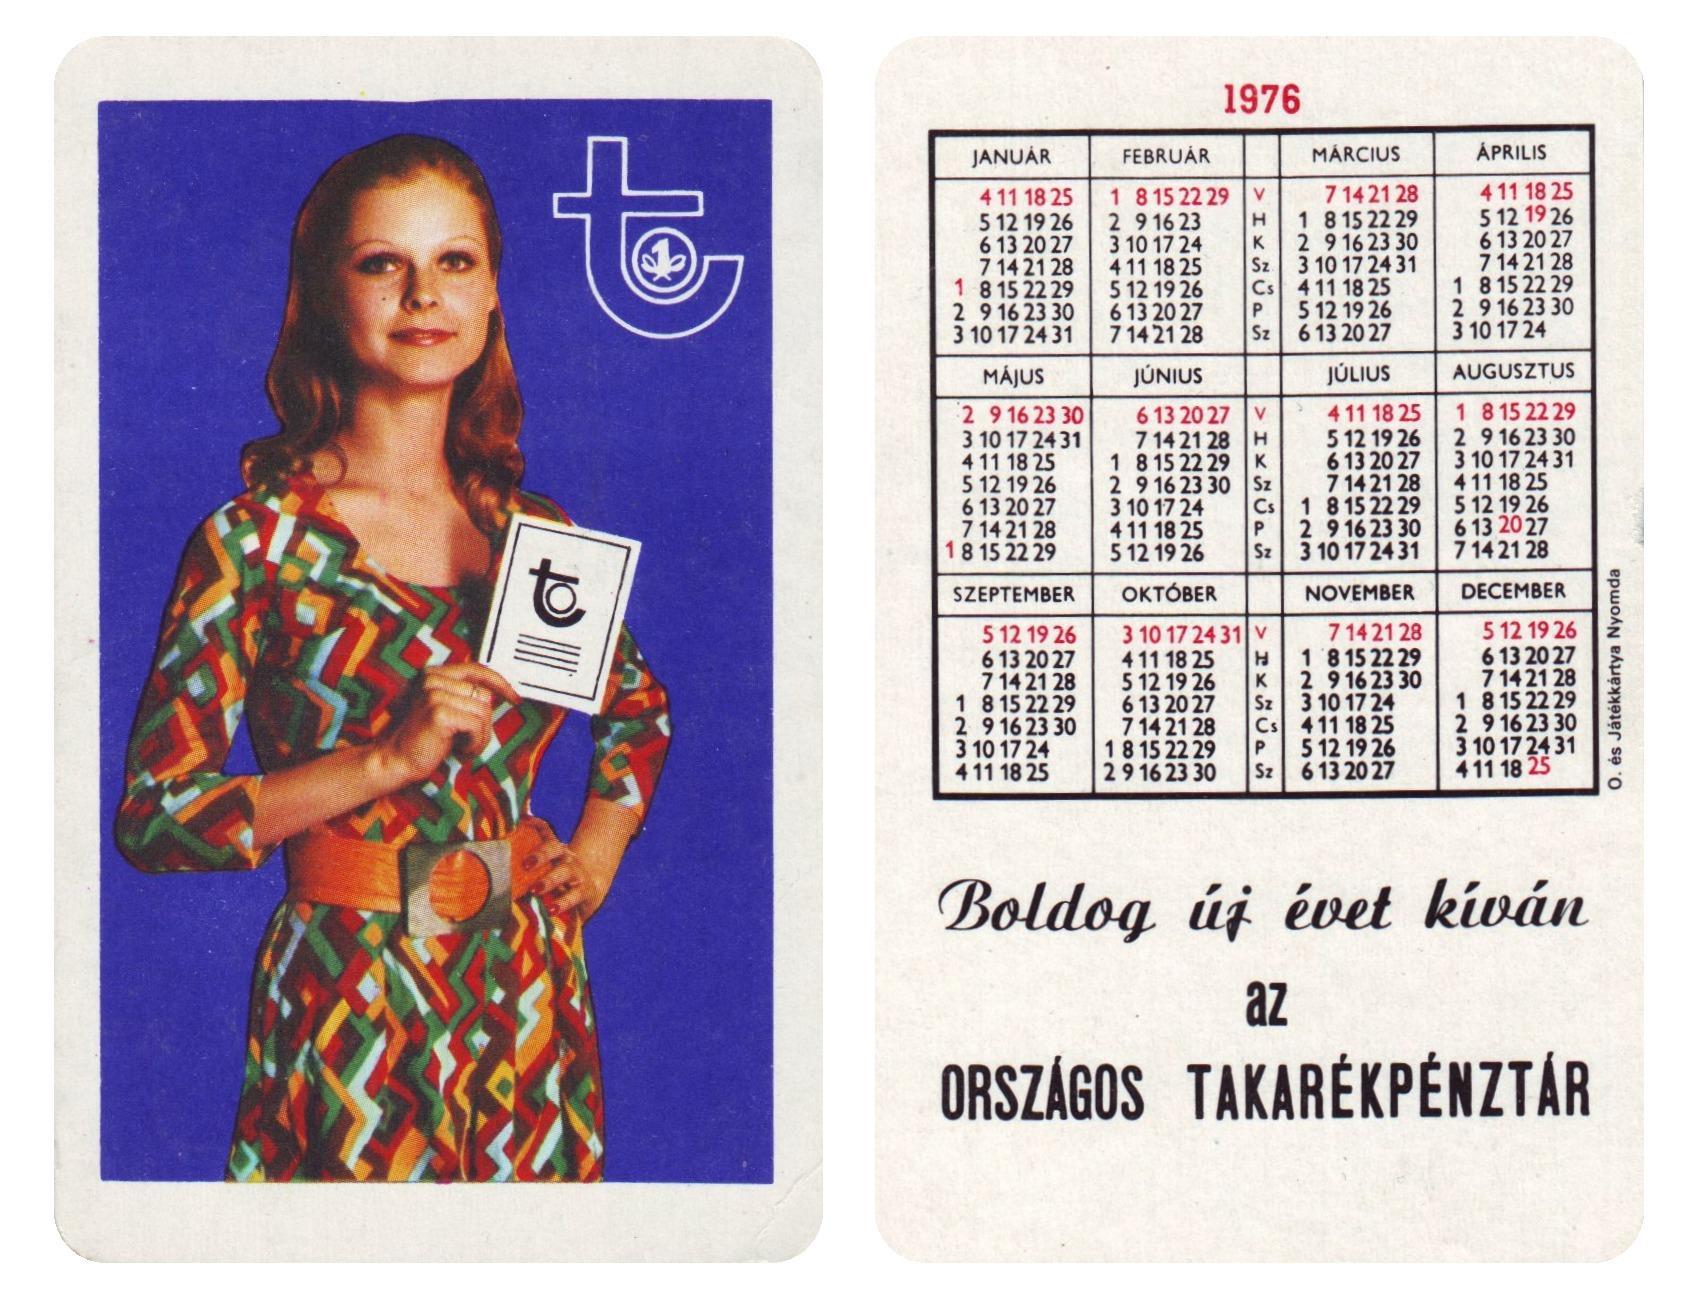 http://www.forintportal.hu/kartyanaptar/www_forintportal_hu_1975_kartyanaptar_011_nagy.jpg